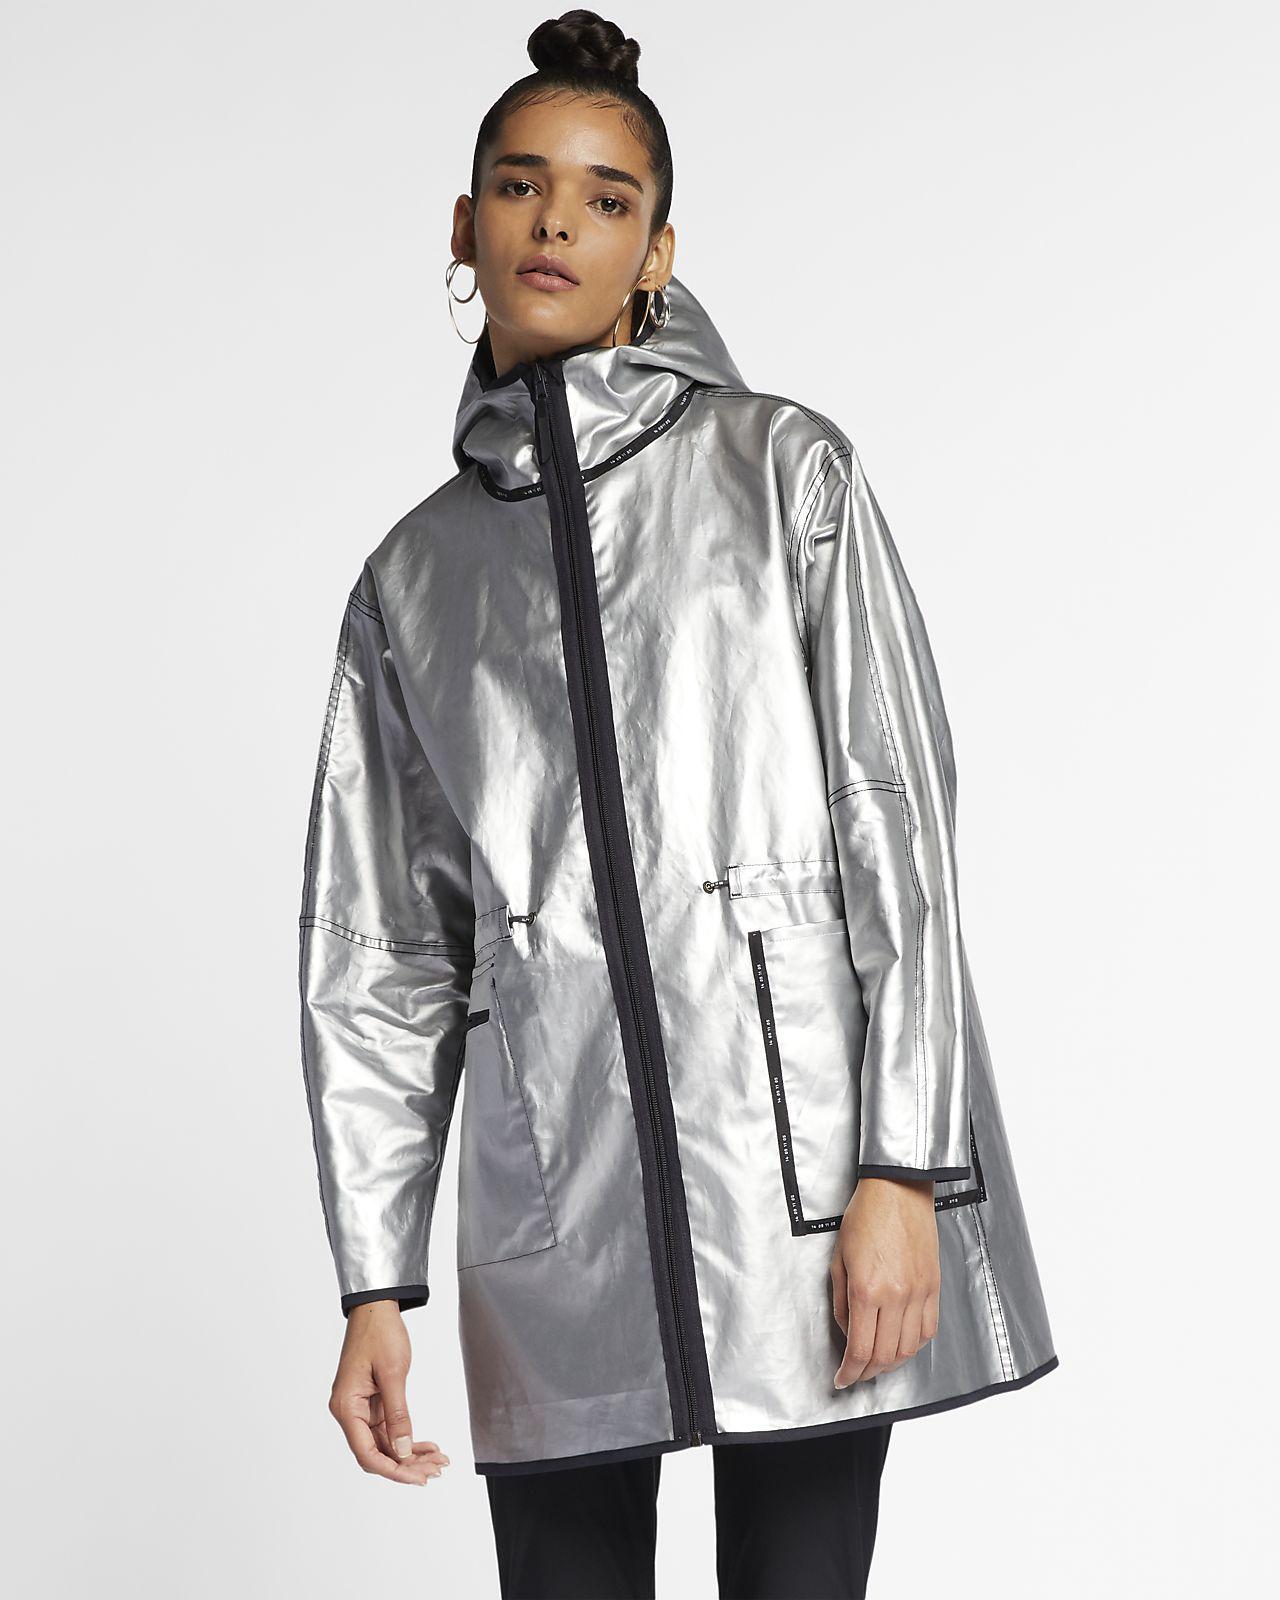 59bd5bd412c3 Nike Sportswear Tech Pack Woven Jacket. Nike.com MA